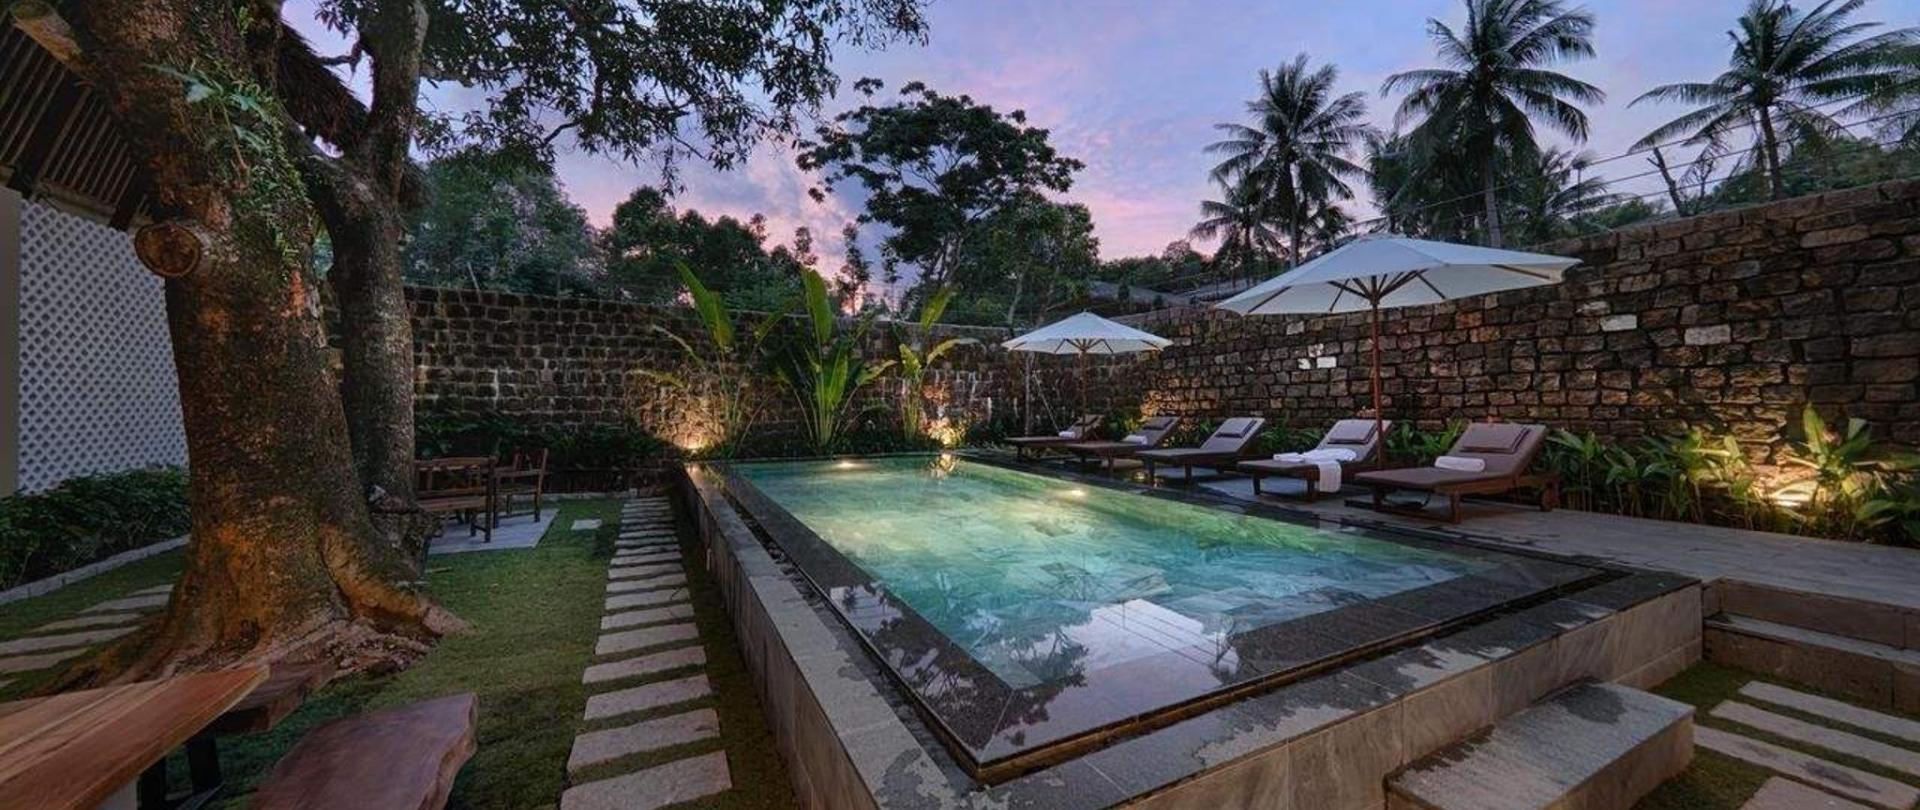 Bể bơi tại 9Station hostel